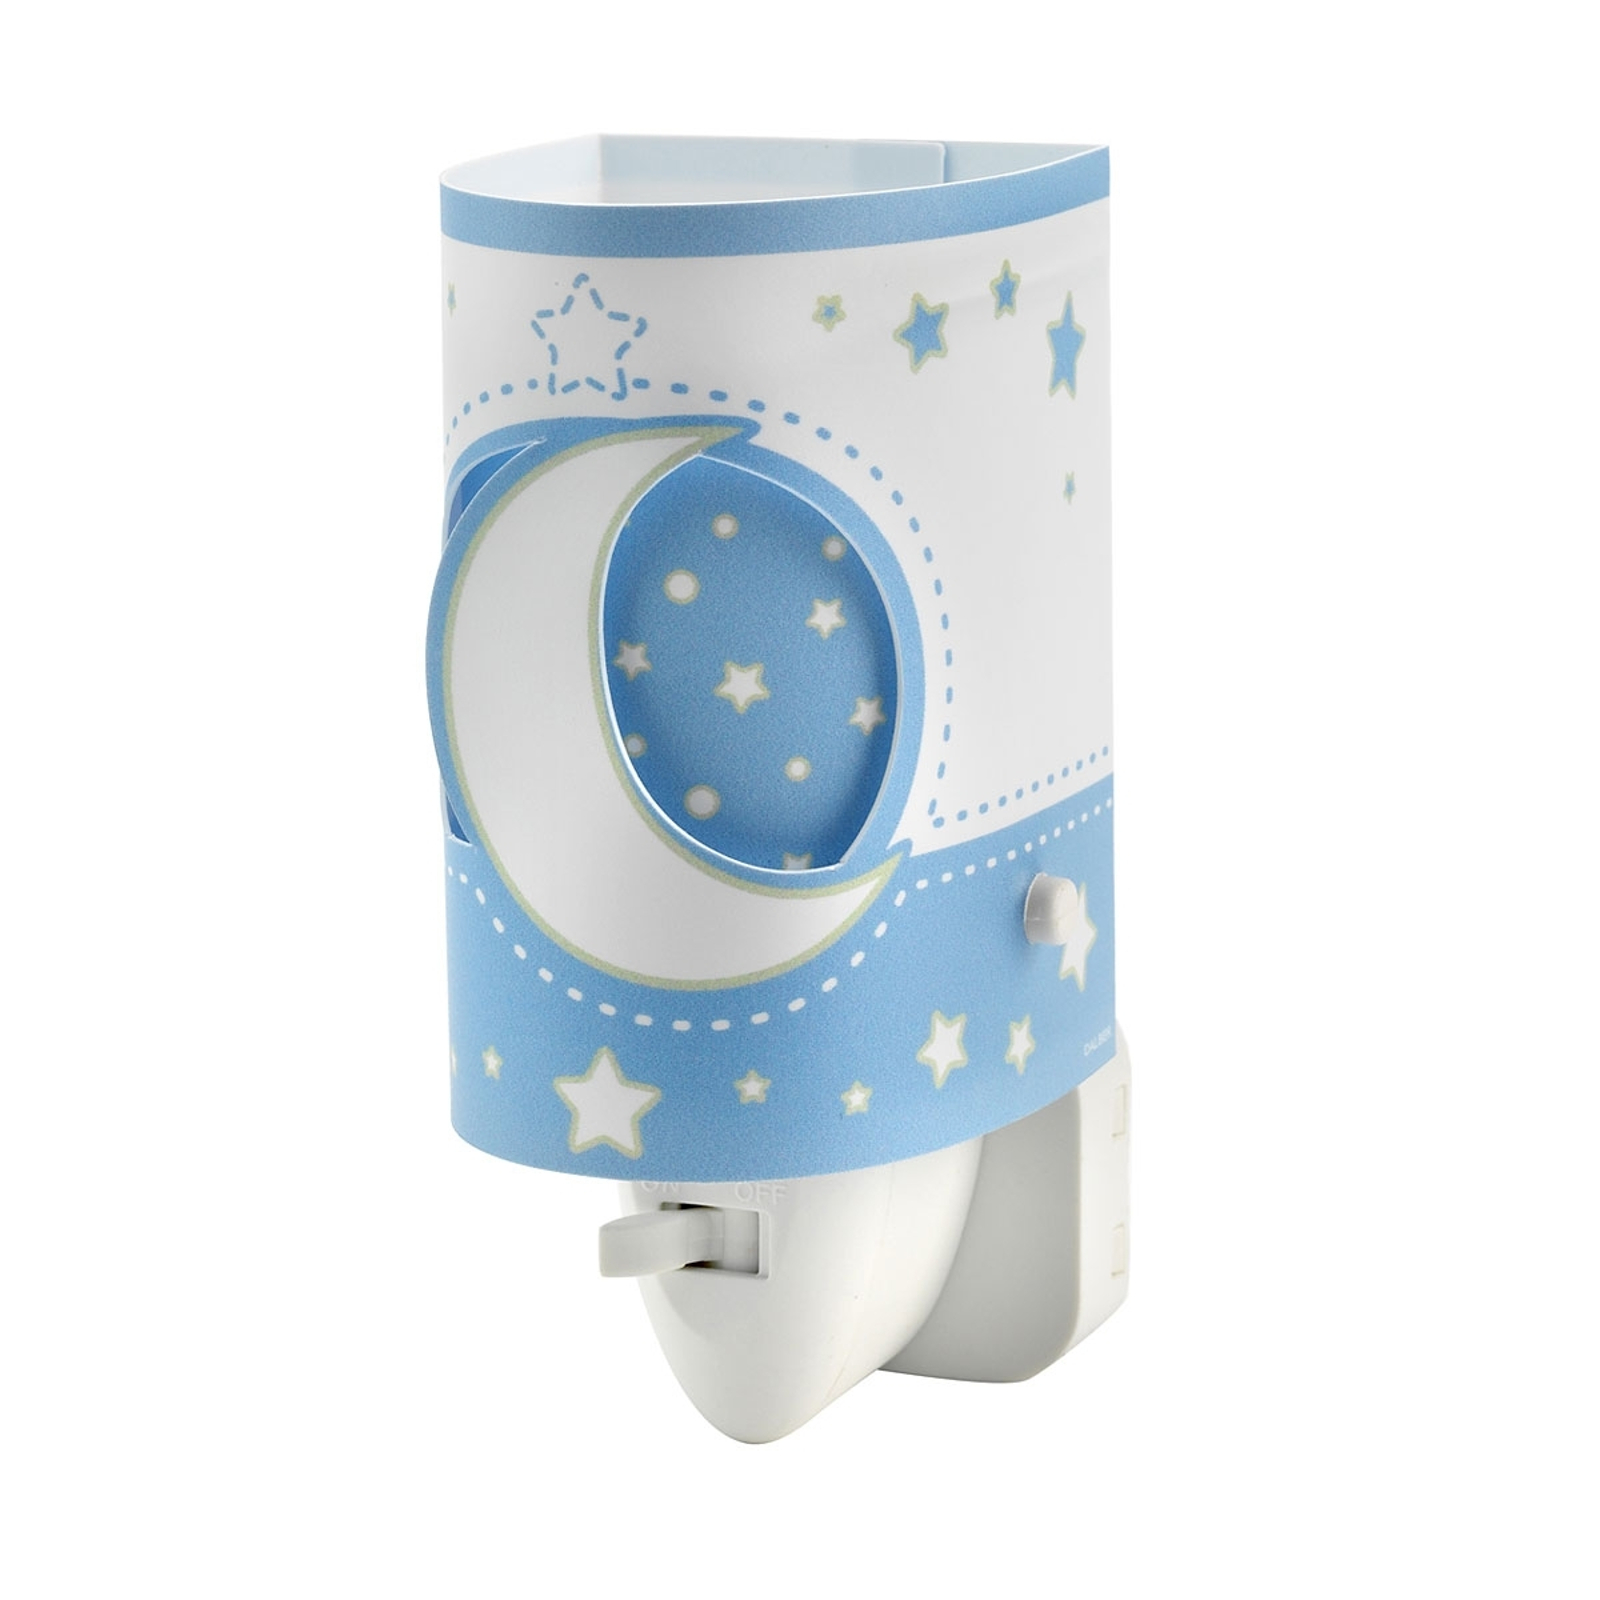 Babyegnet Stars LED-natlampe i lyseblåt